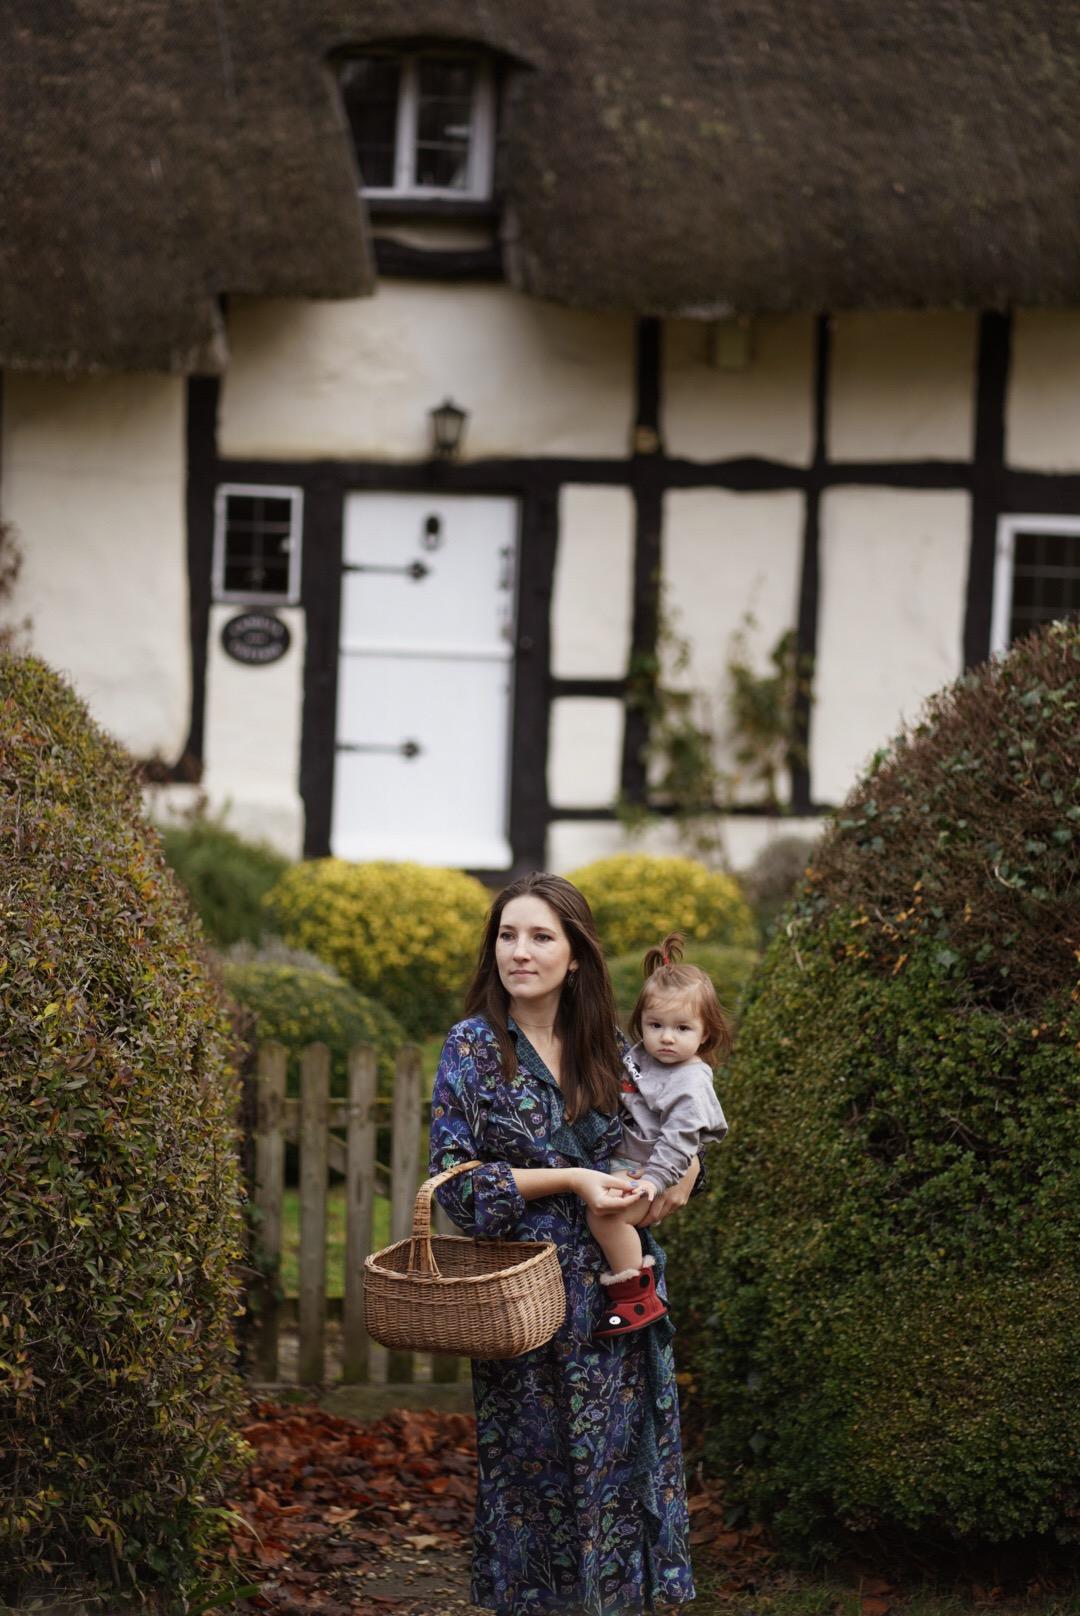 A Cottage fairytale | All Mums Talk